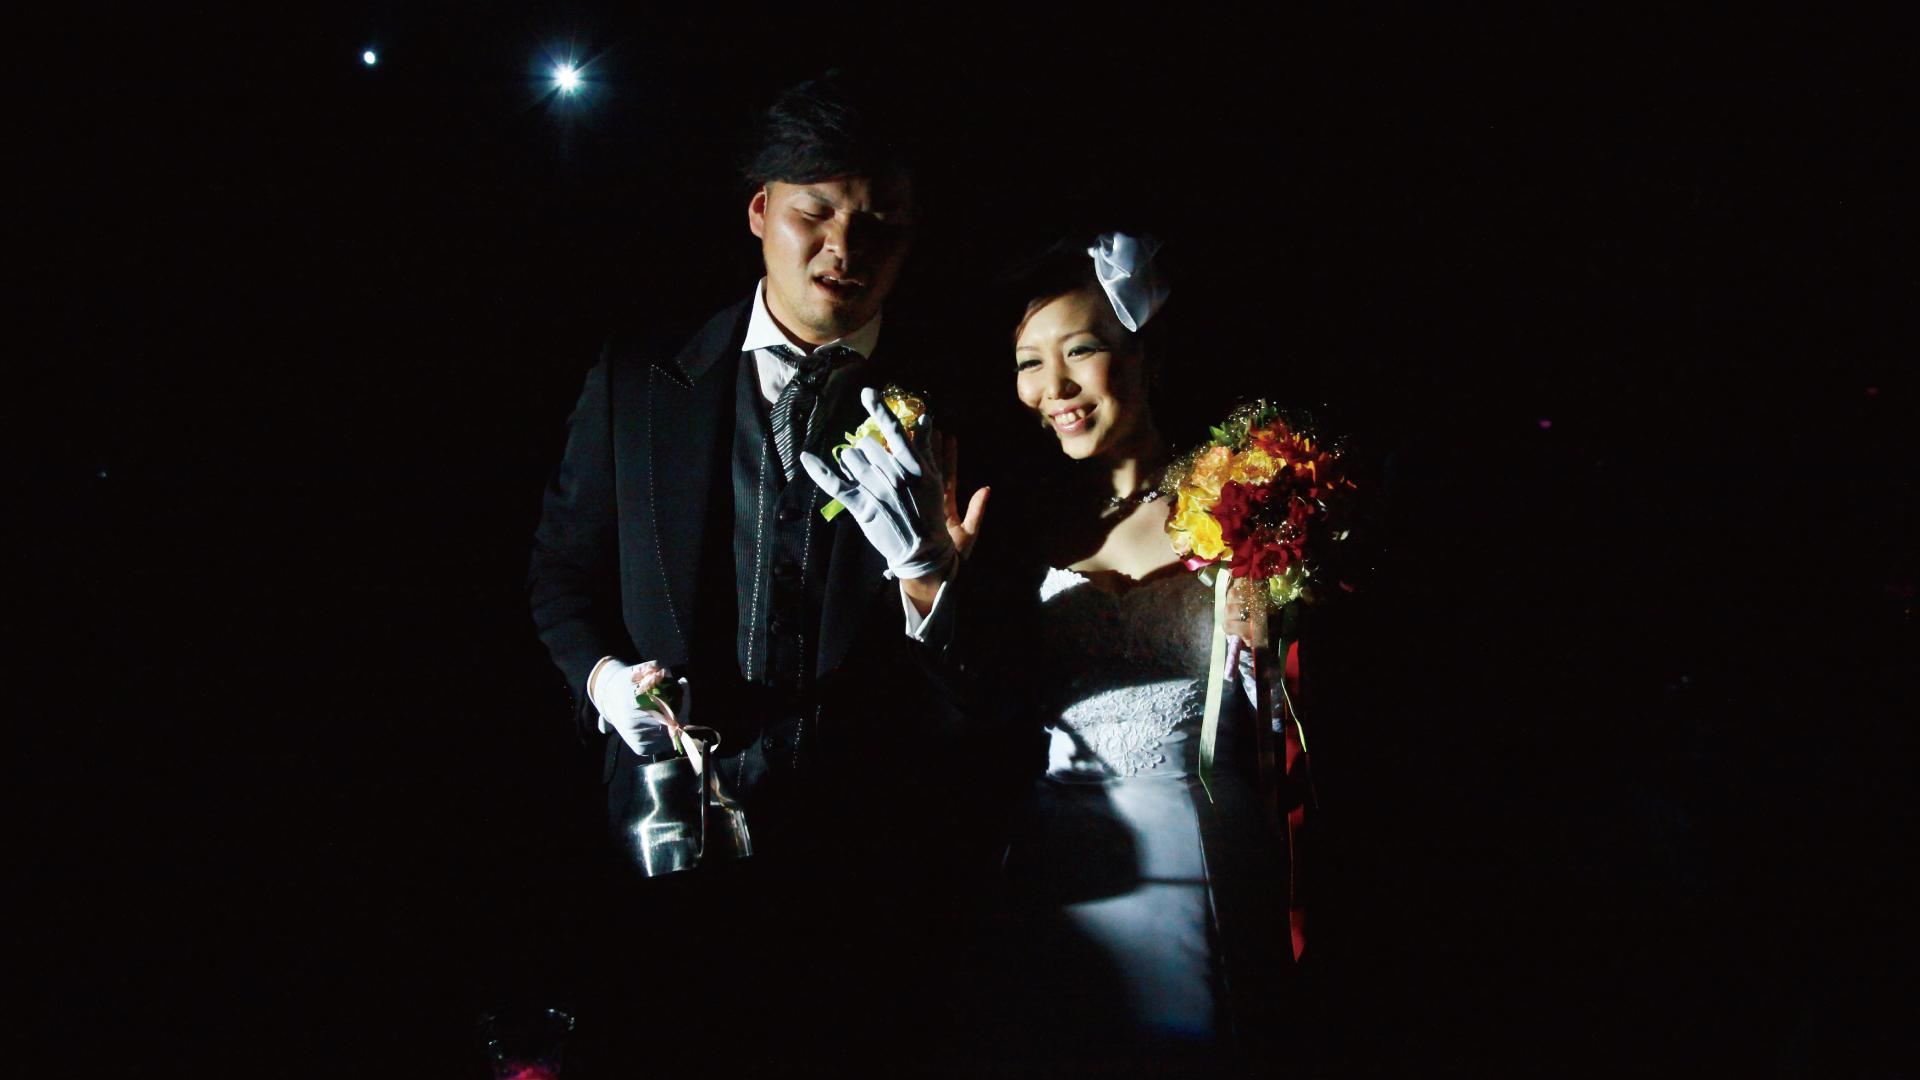 doi_happy_wedding